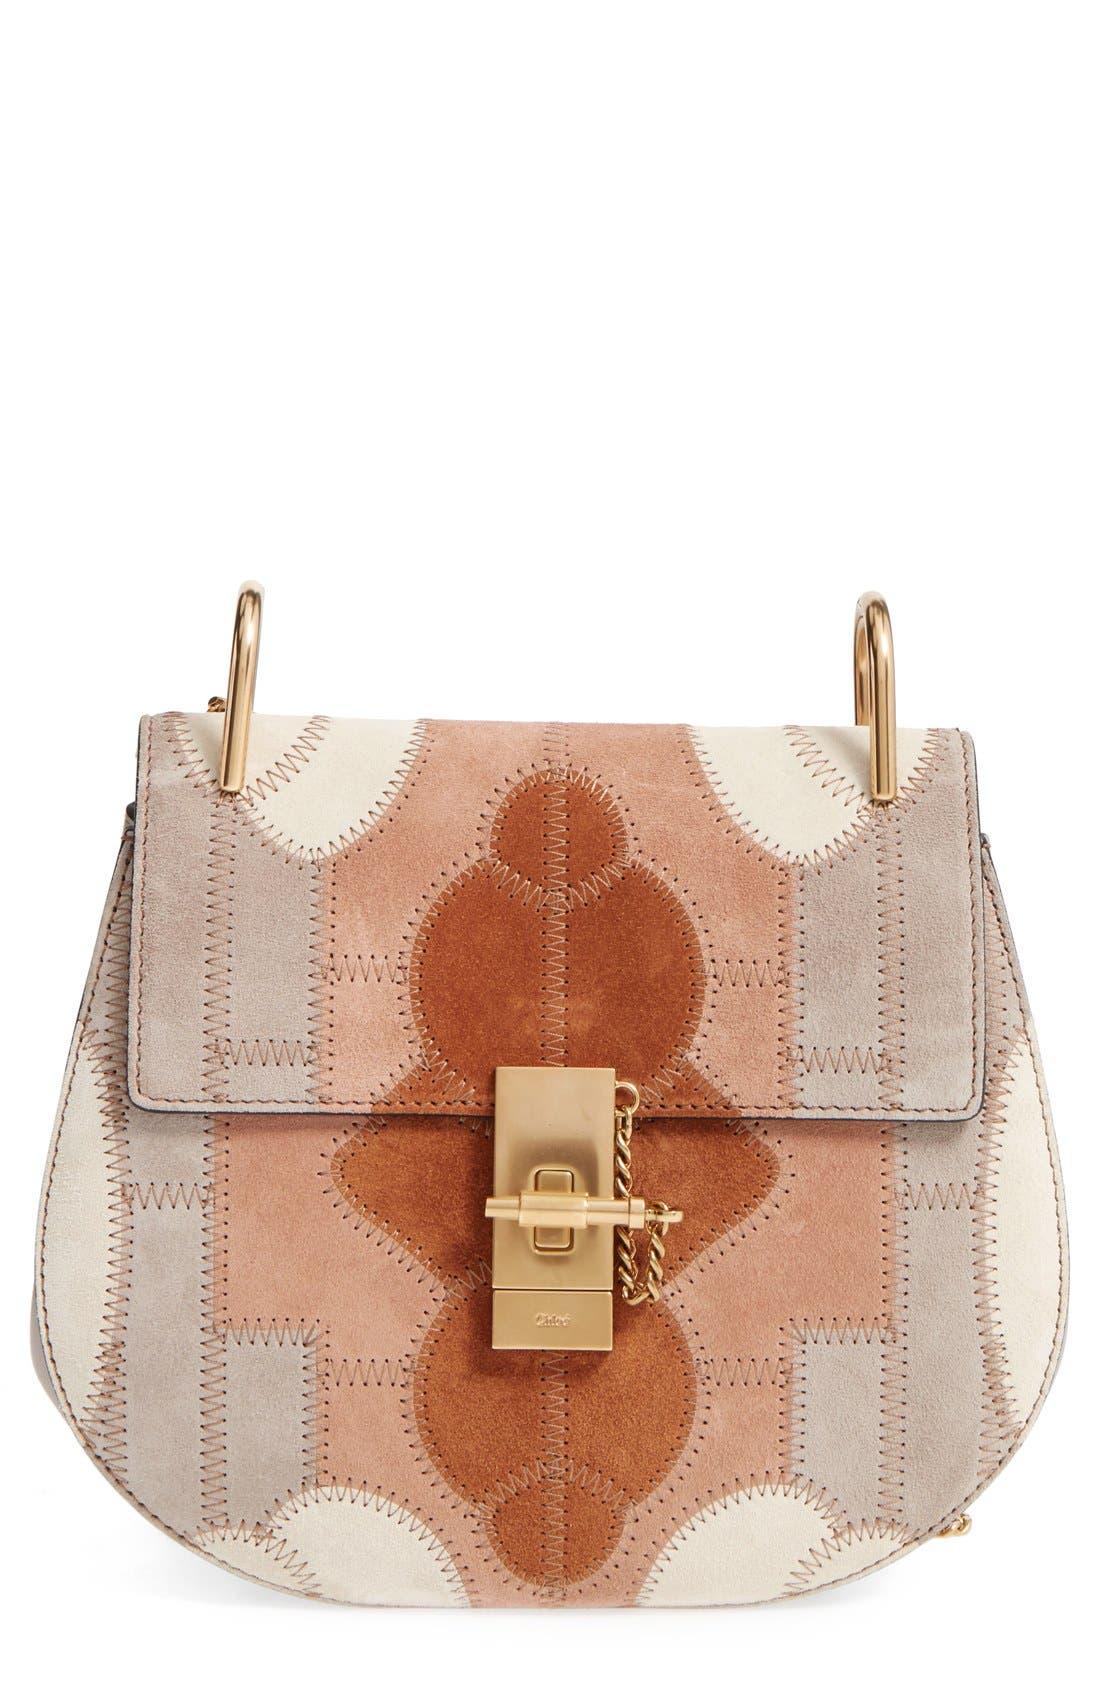 Alternate Image 1 Selected - Chloé 'Small Drew' Patchwork Suede Shoulder Bag